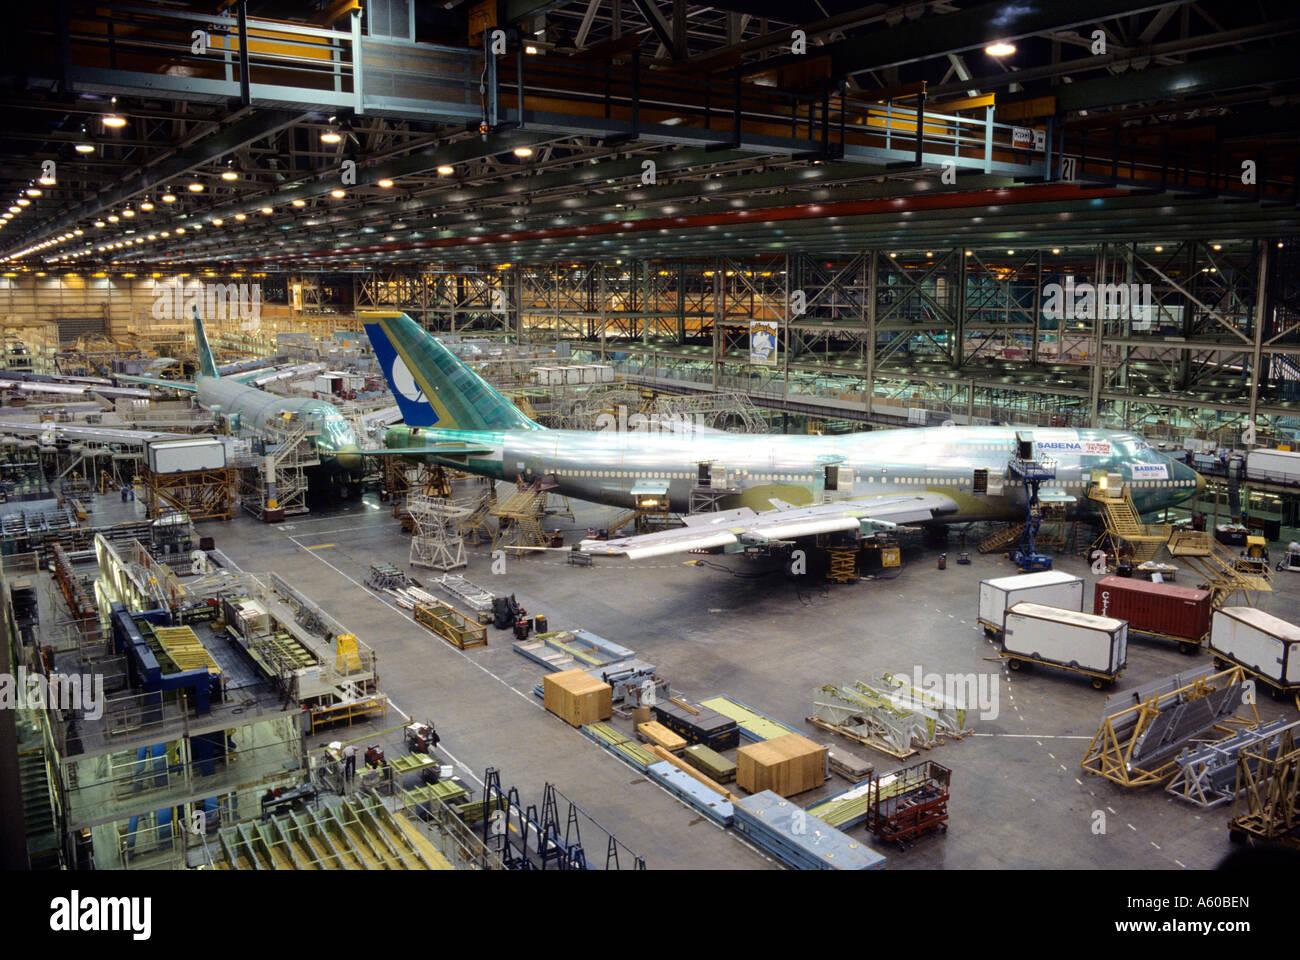 Boeing 747 plant in Everett Washington Stock Photo: 11418908